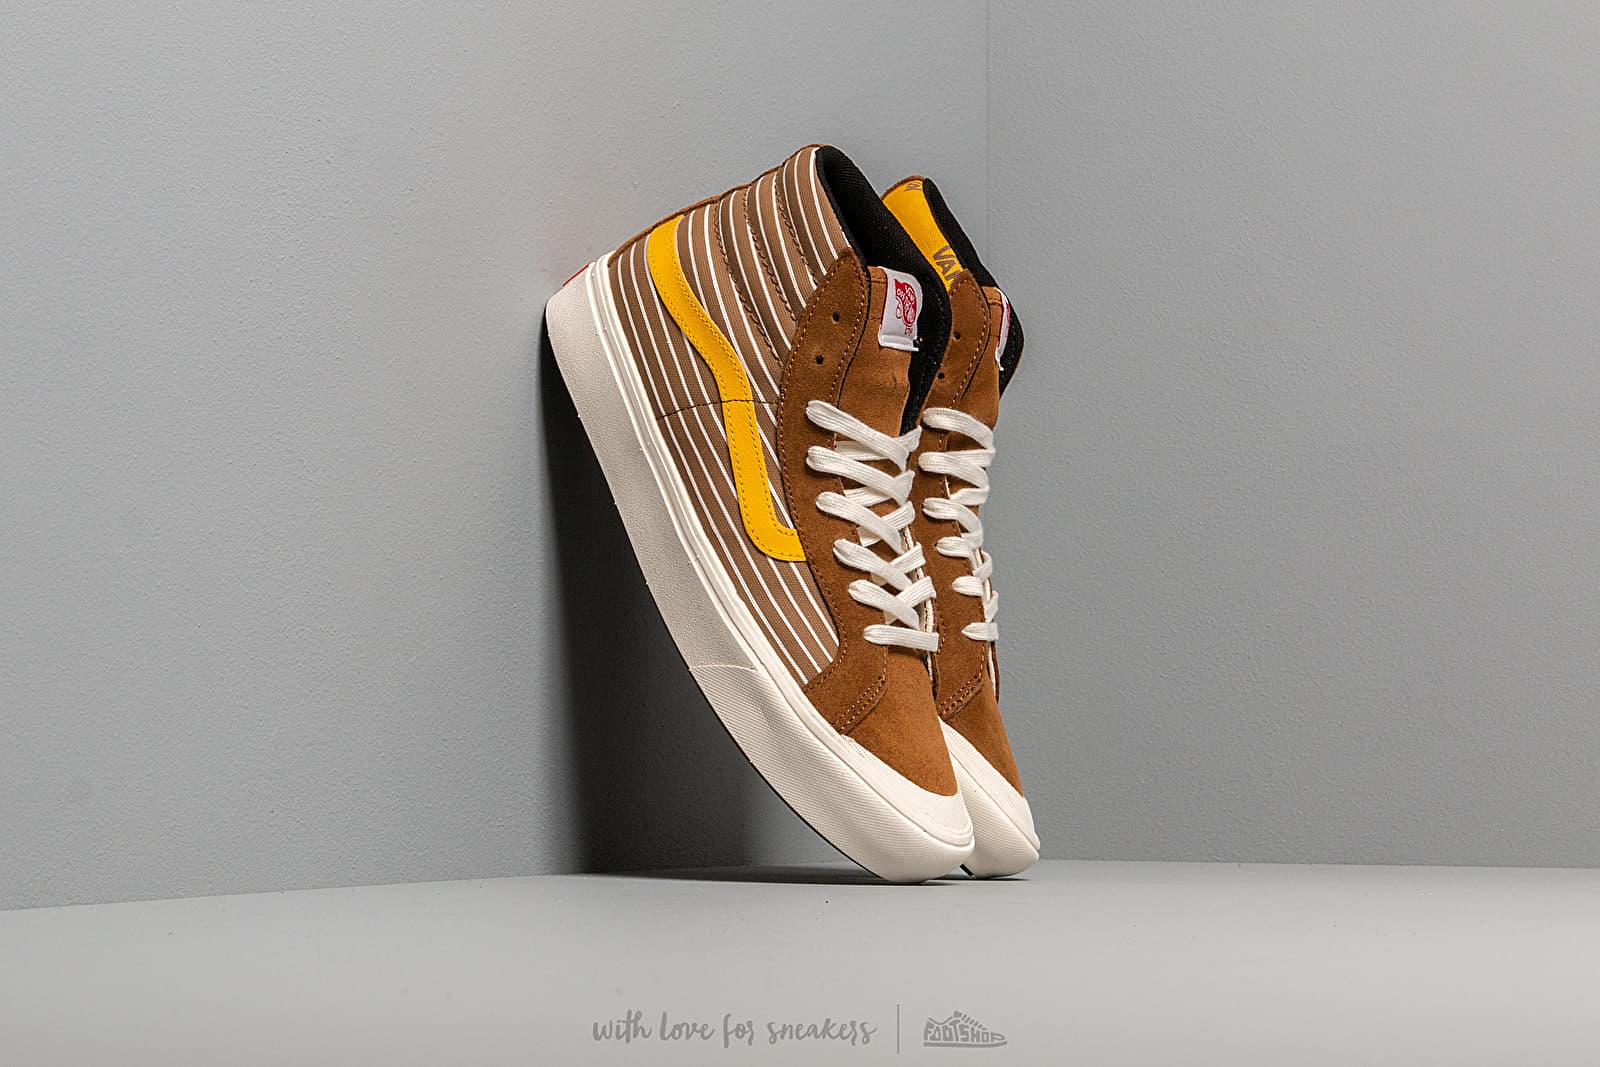 Pánské tenisky a boty Vans Comfycush Style 1 (Suede/ Canvas) Brown